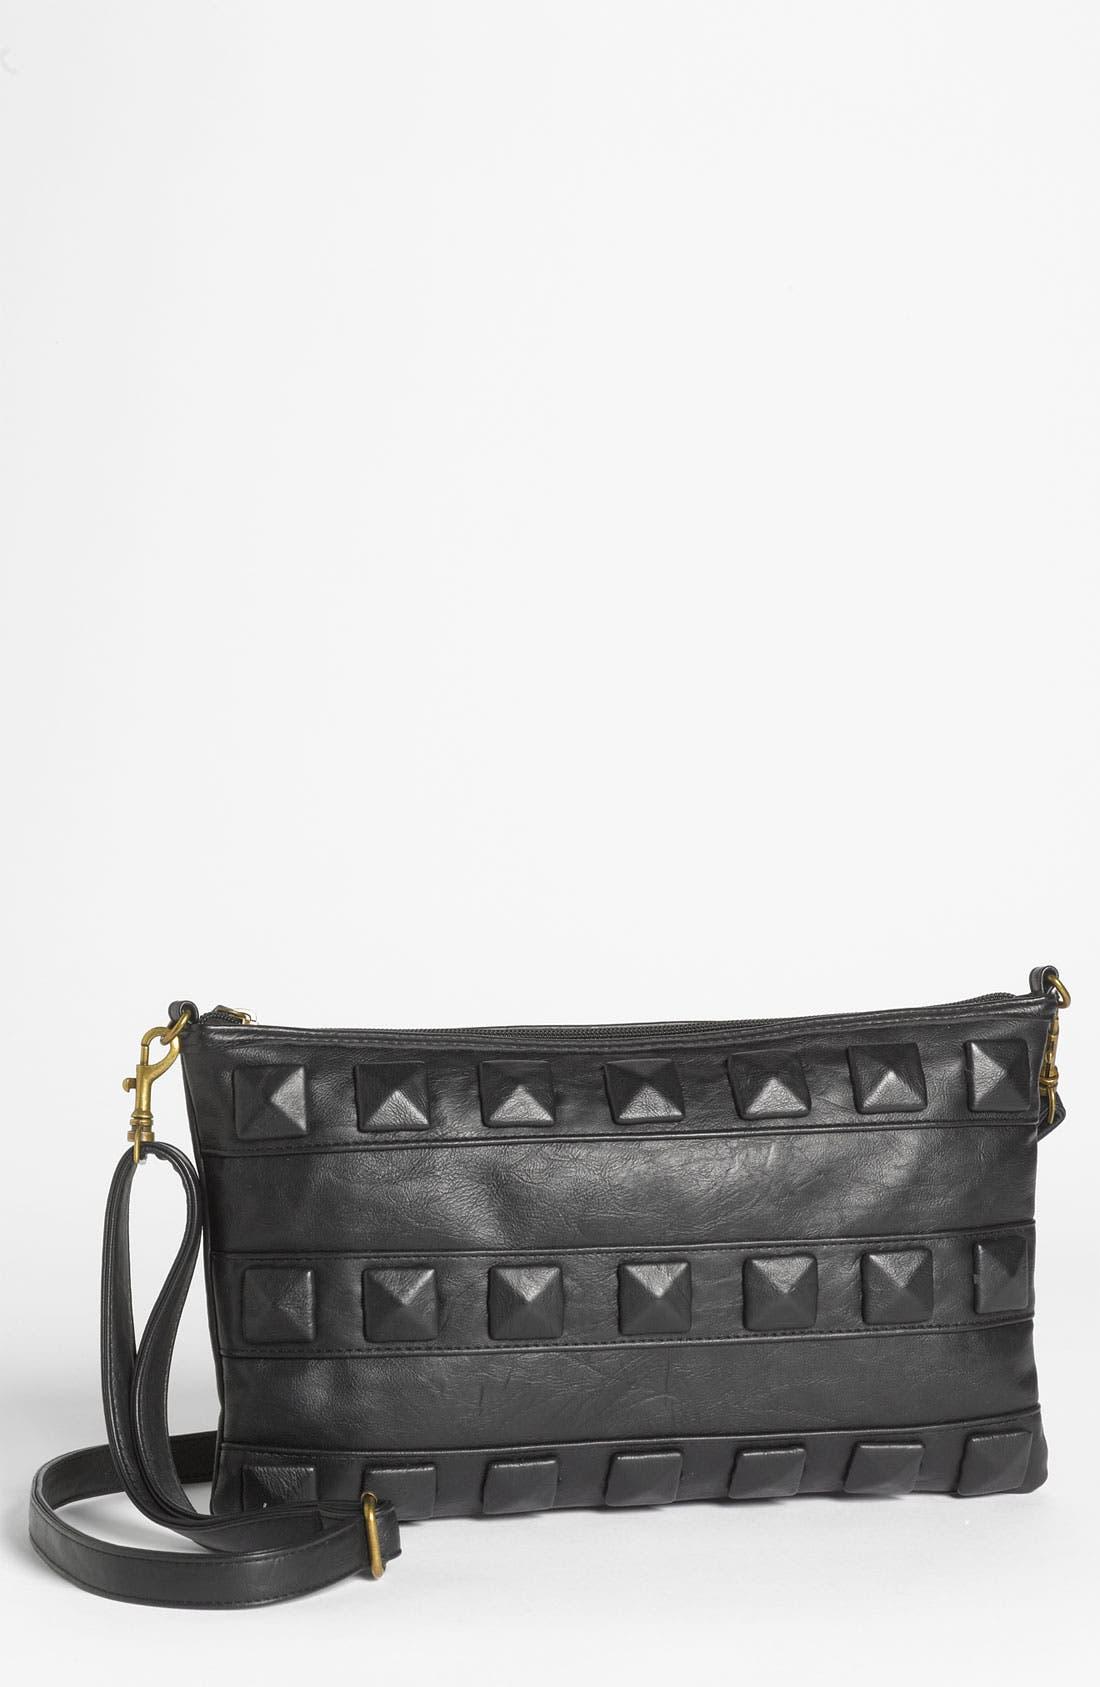 Main Image - Lulu Studded Faux Leather Crossbody Bag